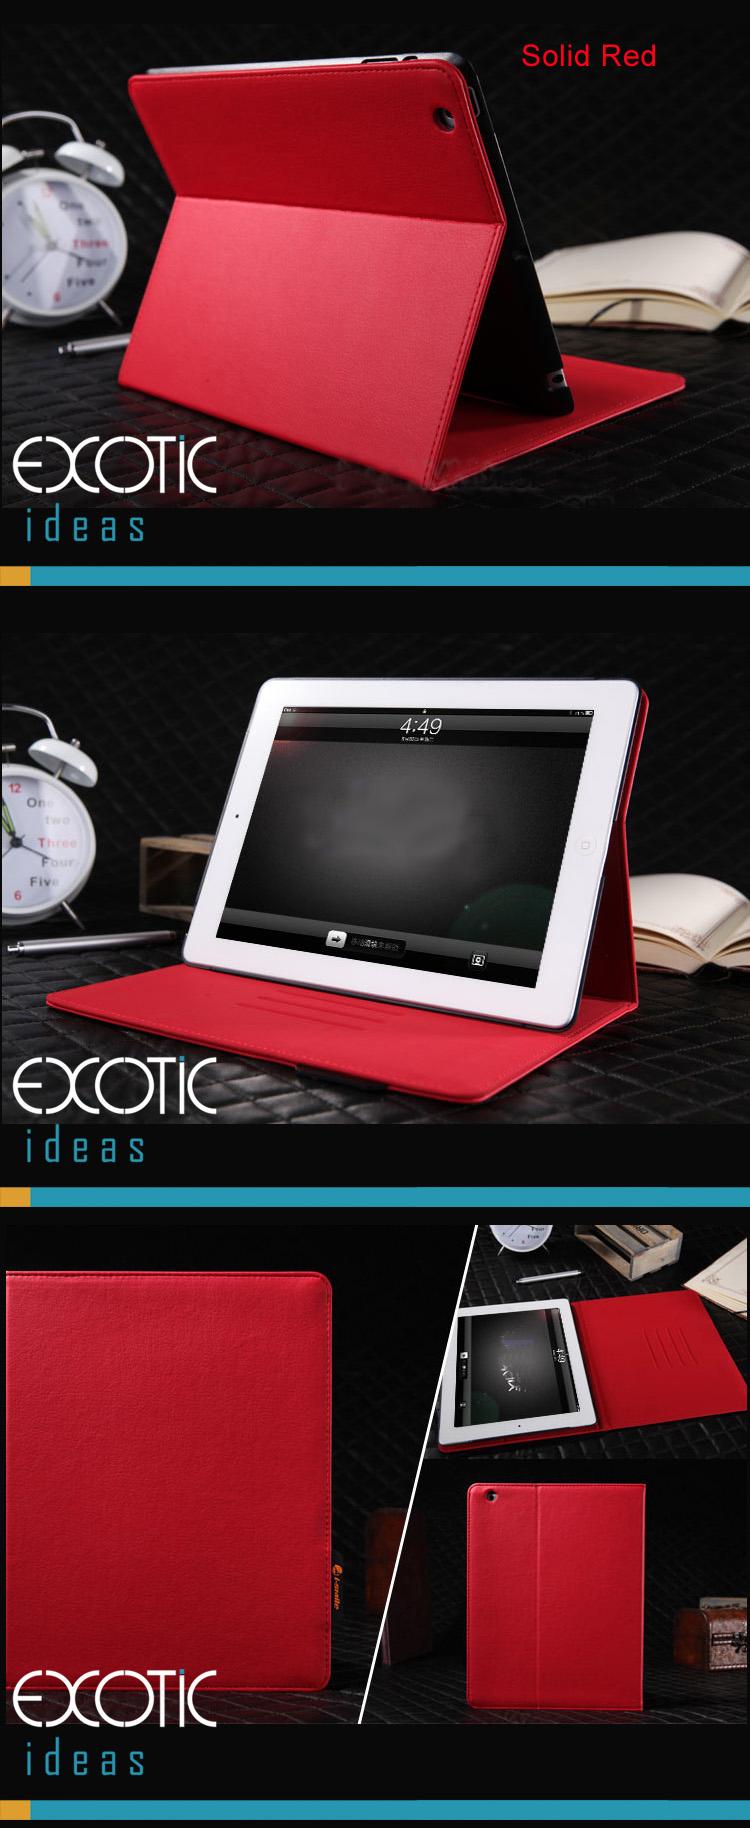 iSmile iPad 2 / The new iPad (iPad 3)  Sleeve Bags Cases - Lattice Pattern Trendy and Fashionable Design, Microfiber Inner Layer, Auto sleep/Awake